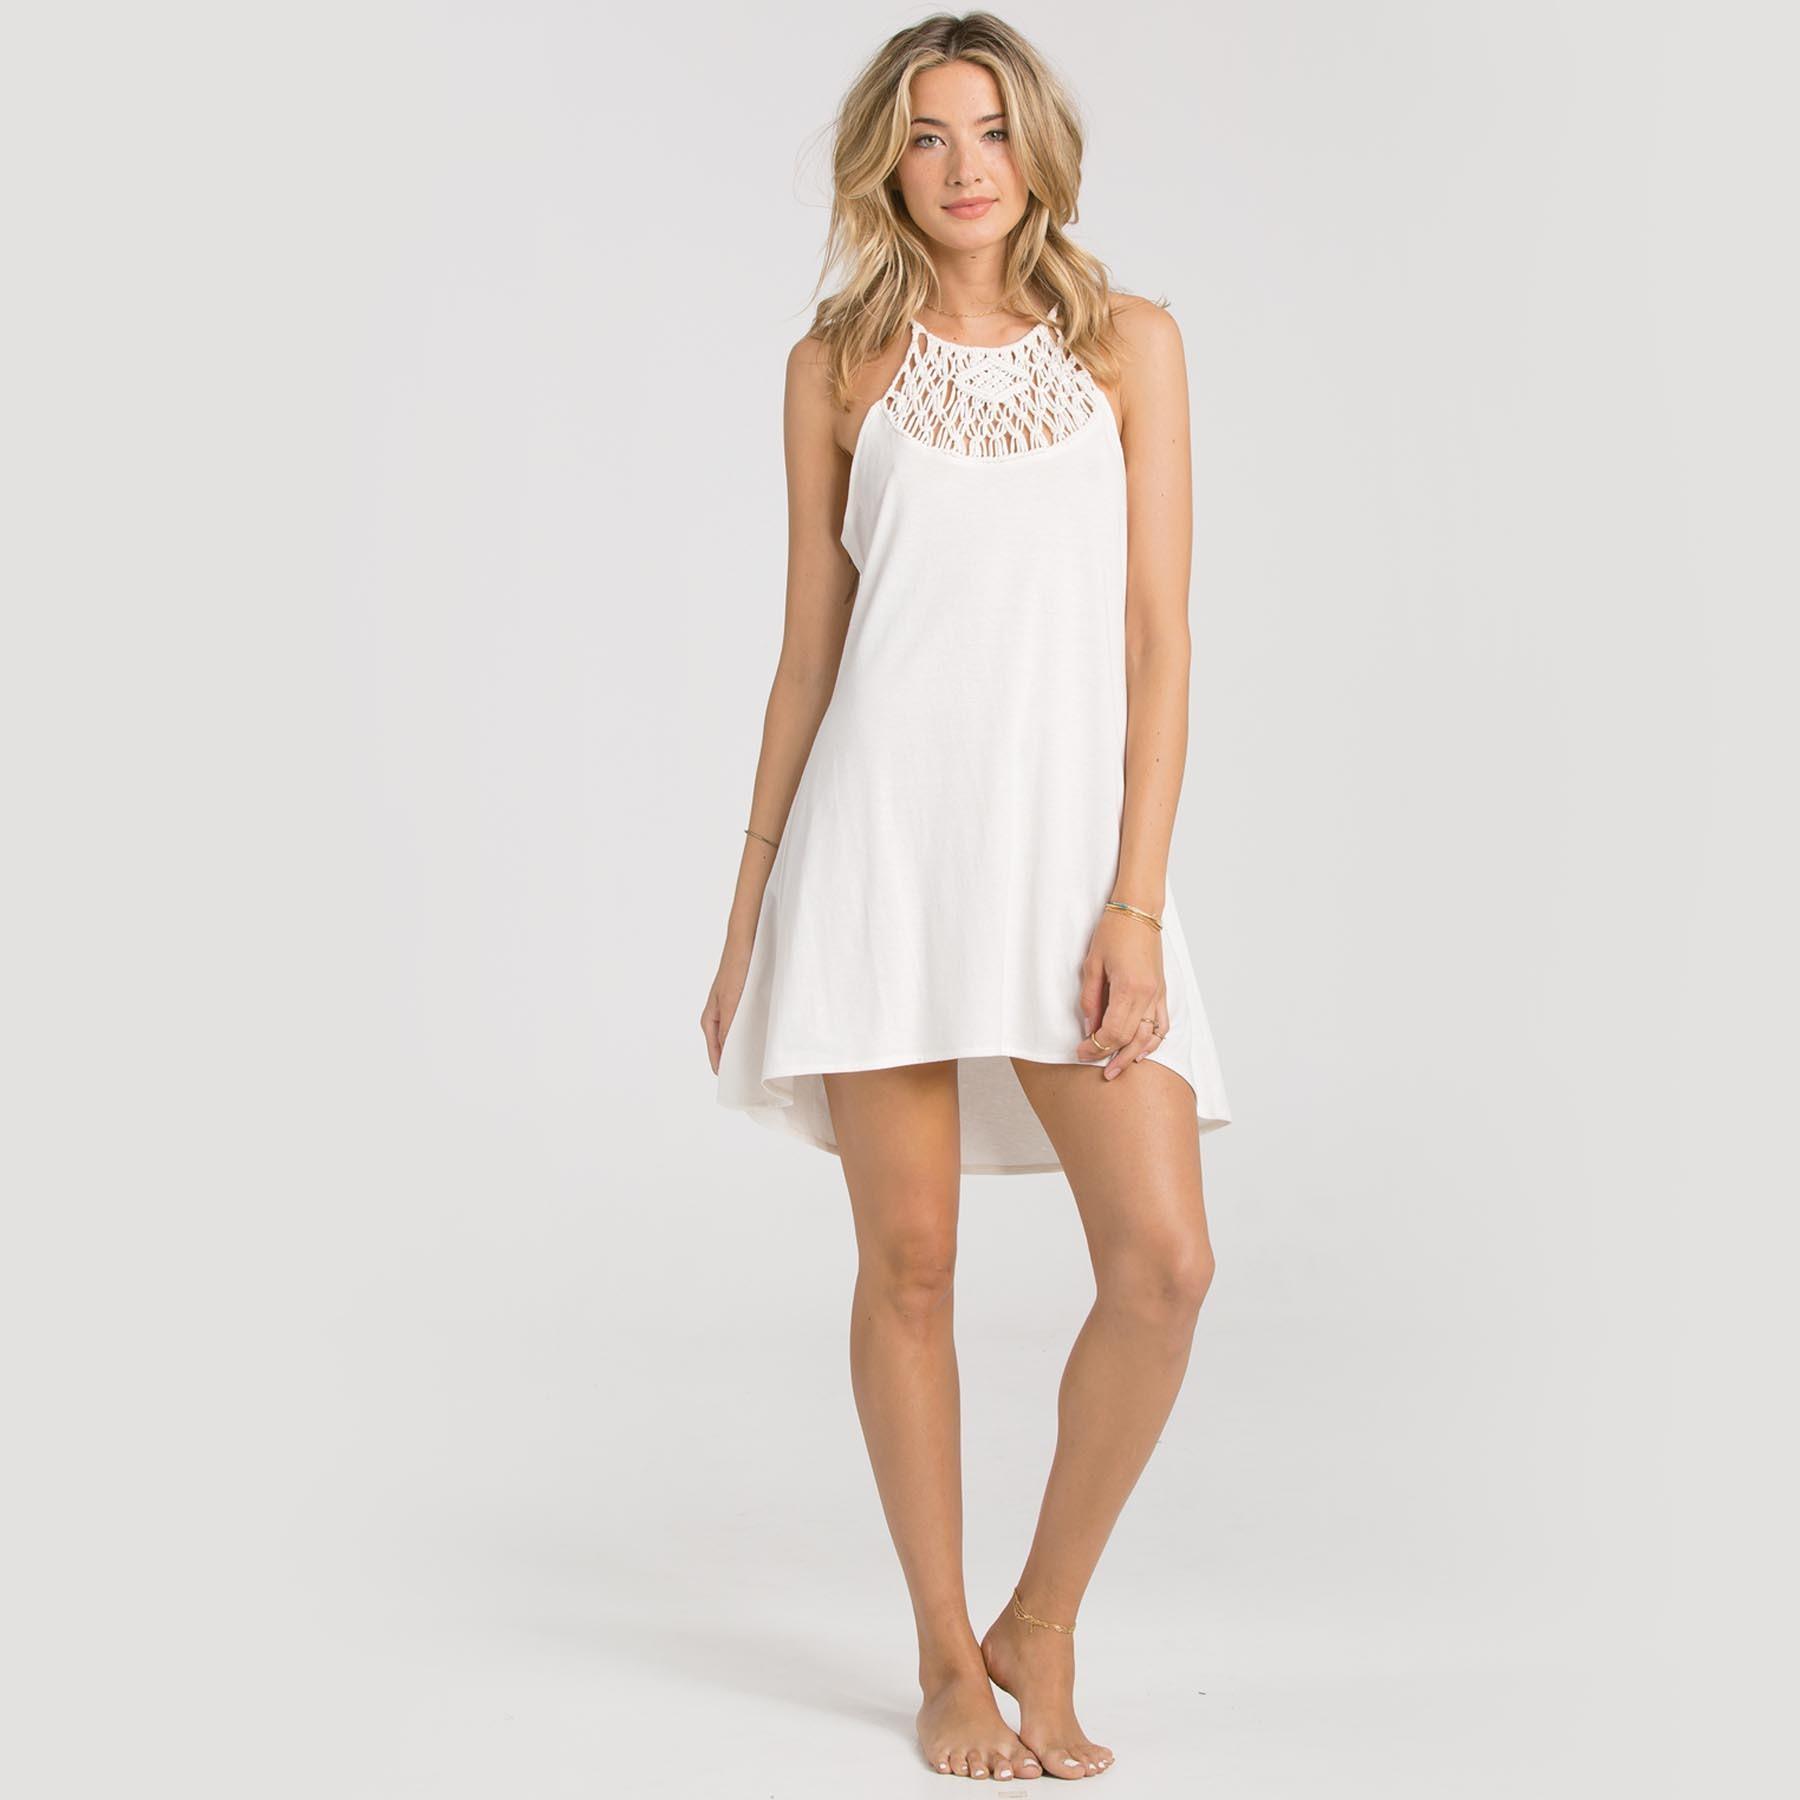 a79534f82 billabong vestidos verano